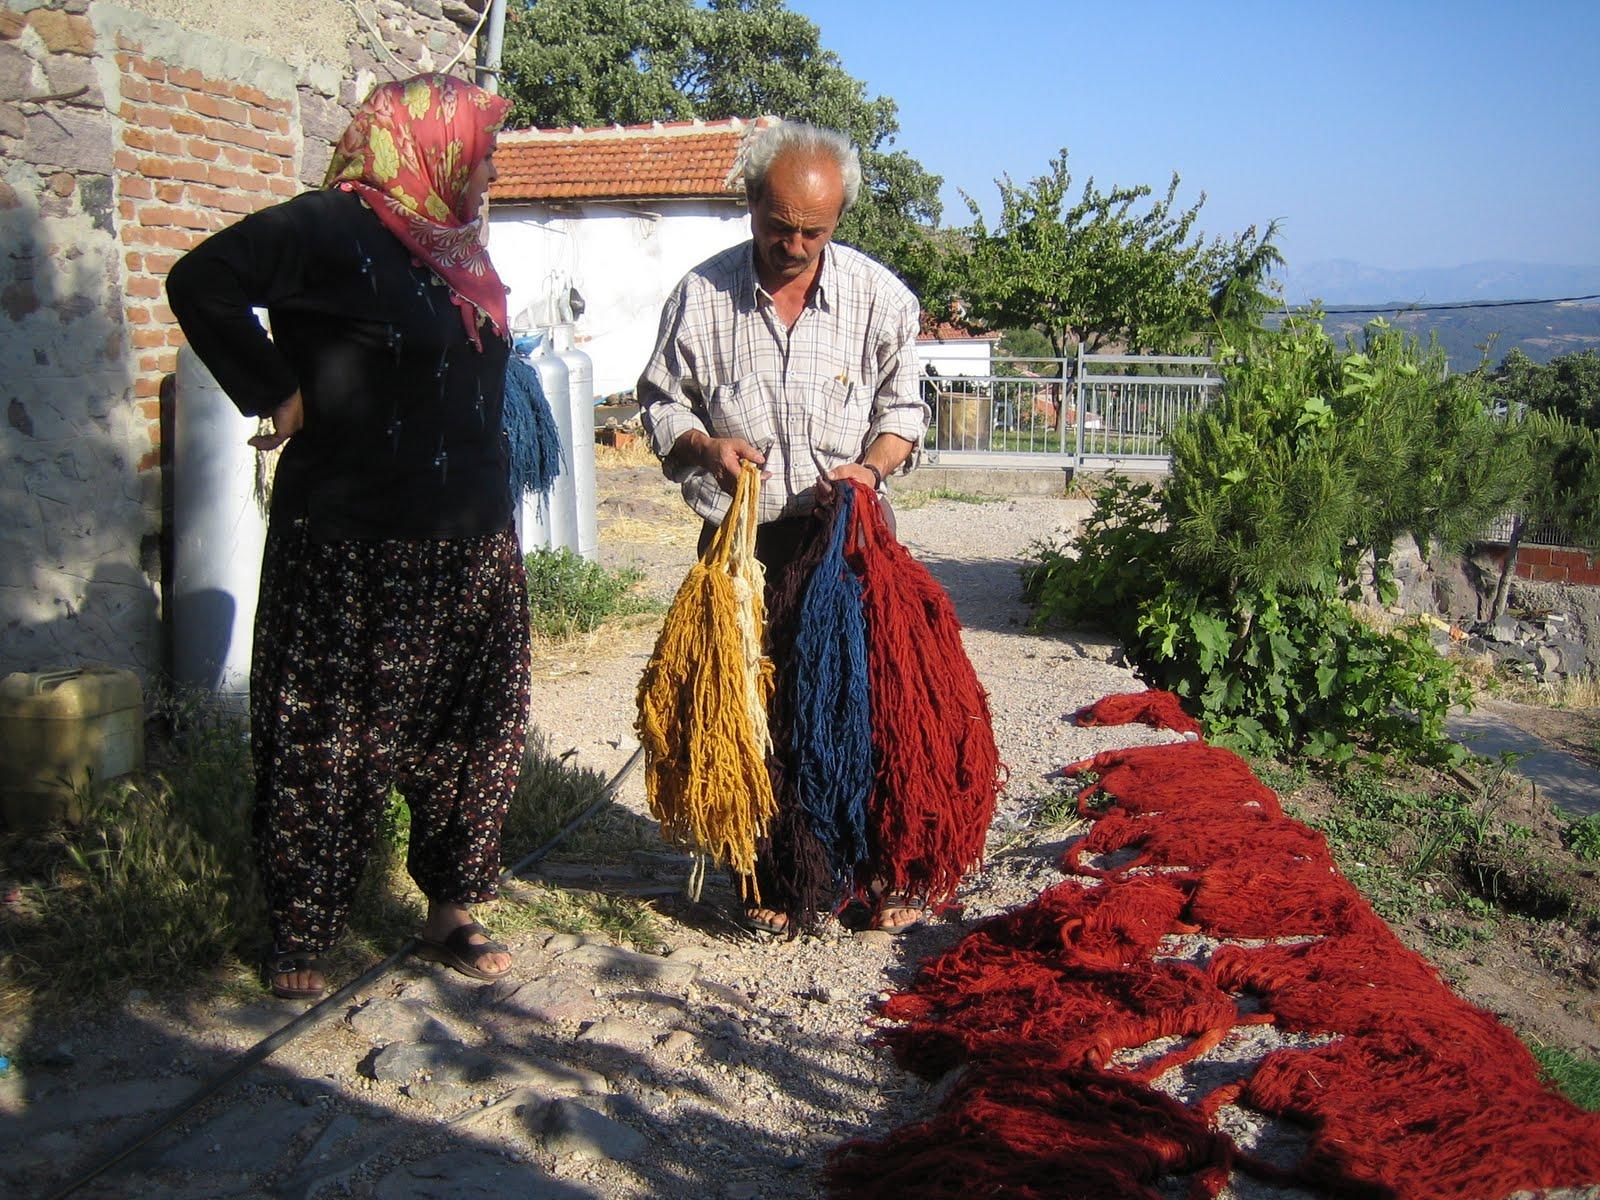 Natural-Dyed yarns are dried, Örselli village Manisa, Western Turkey, 2000s